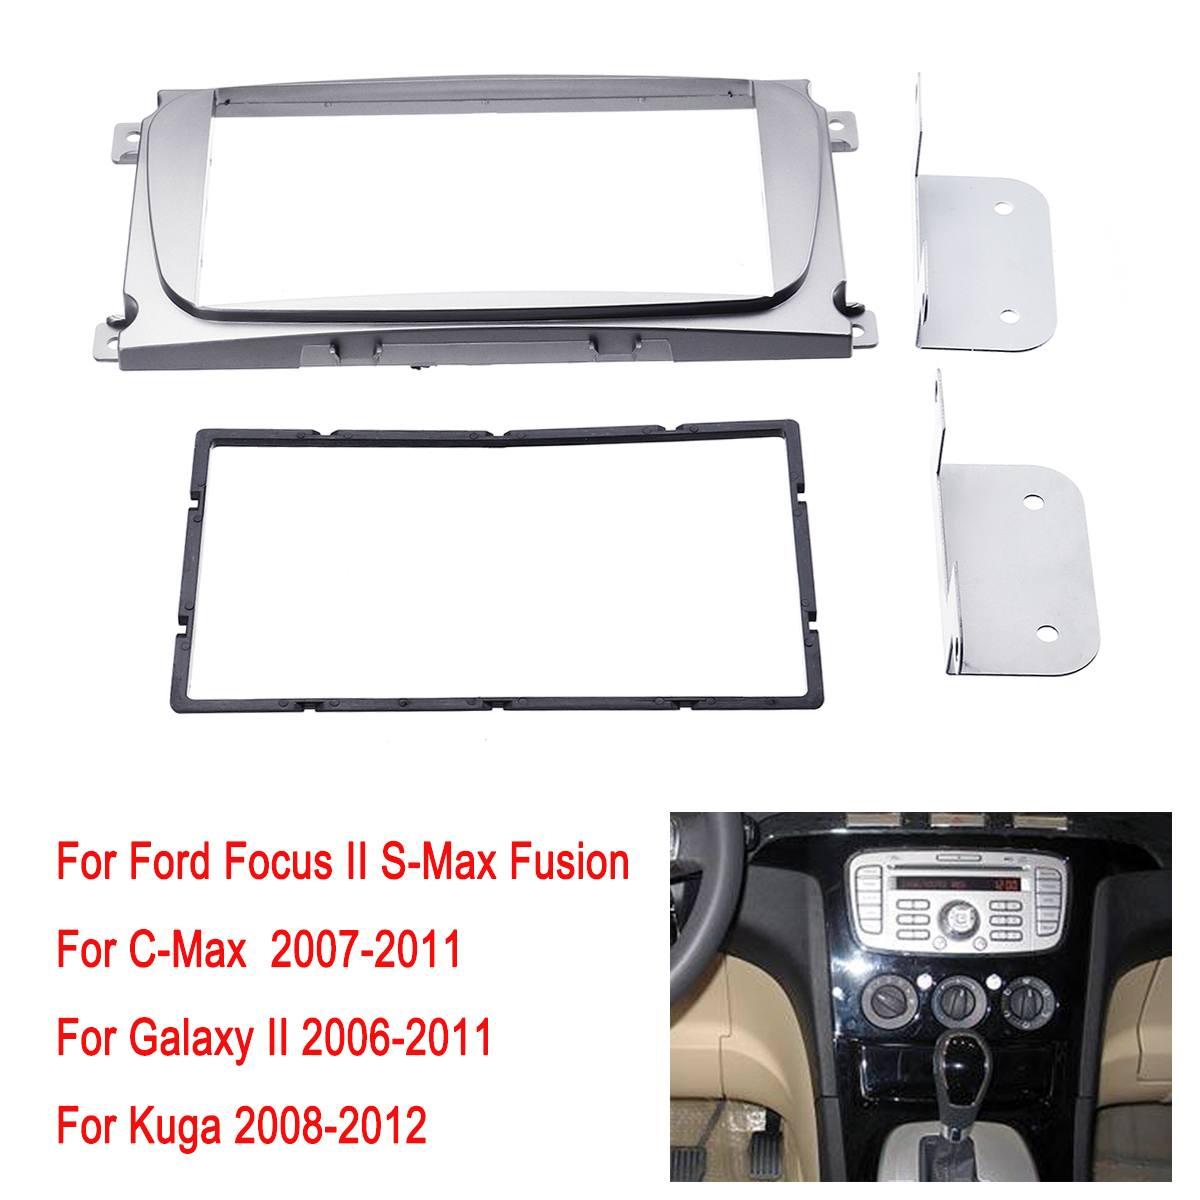 2 Din автомобильный стерео радио фасции рама пластины панели комплект для FORD для Focus II Mondeo S-Max C-Max Galaxy II Kuga